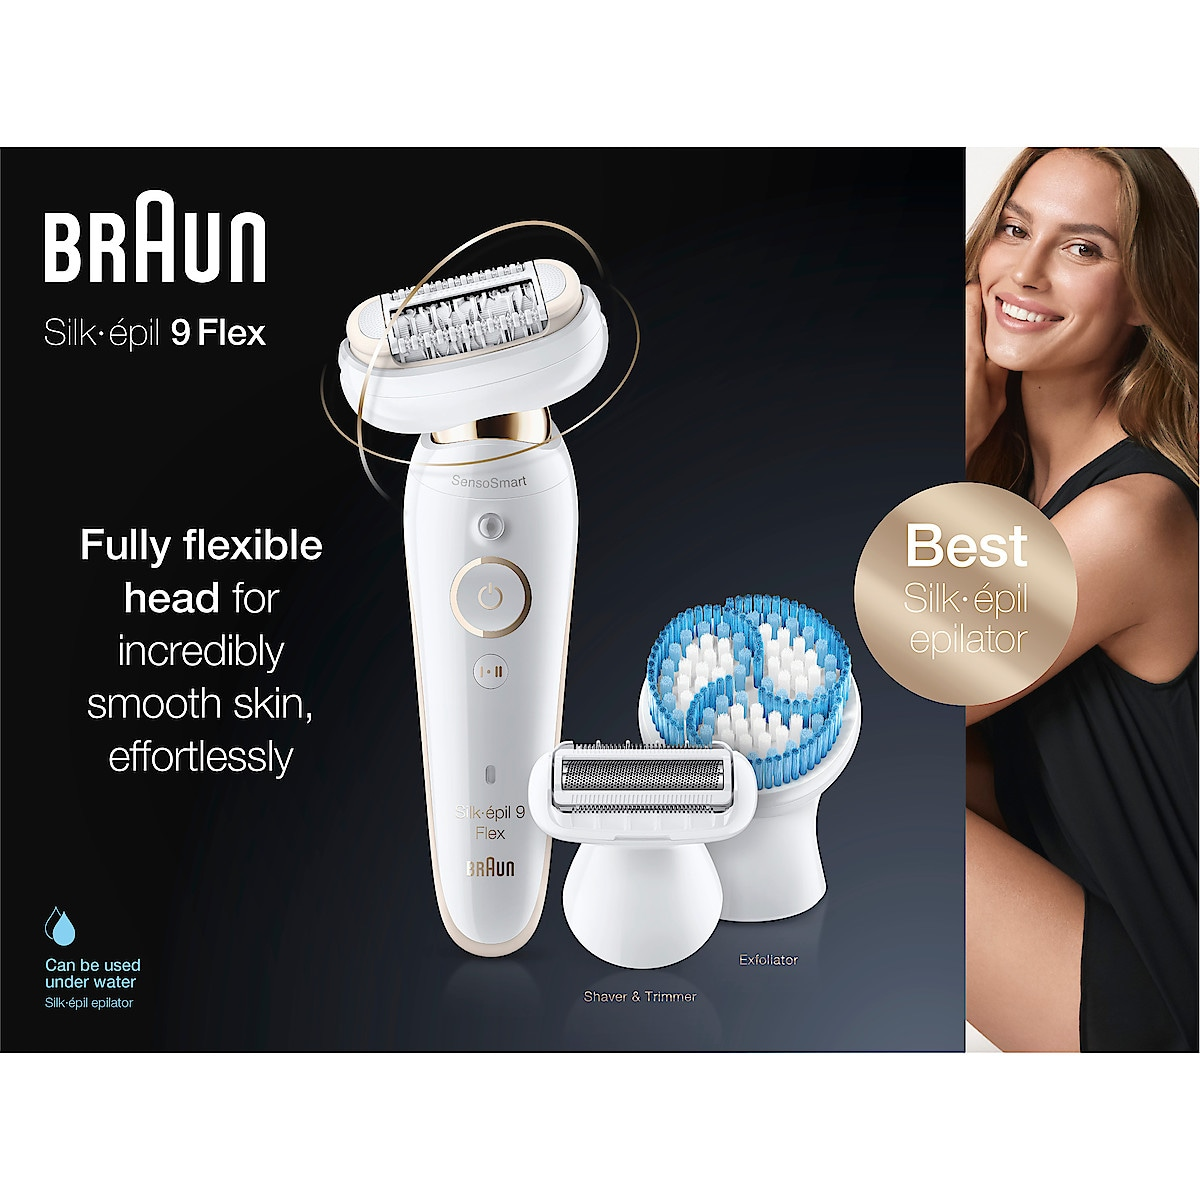 Braun Silk-épil 9 Flex 9-010, epilator